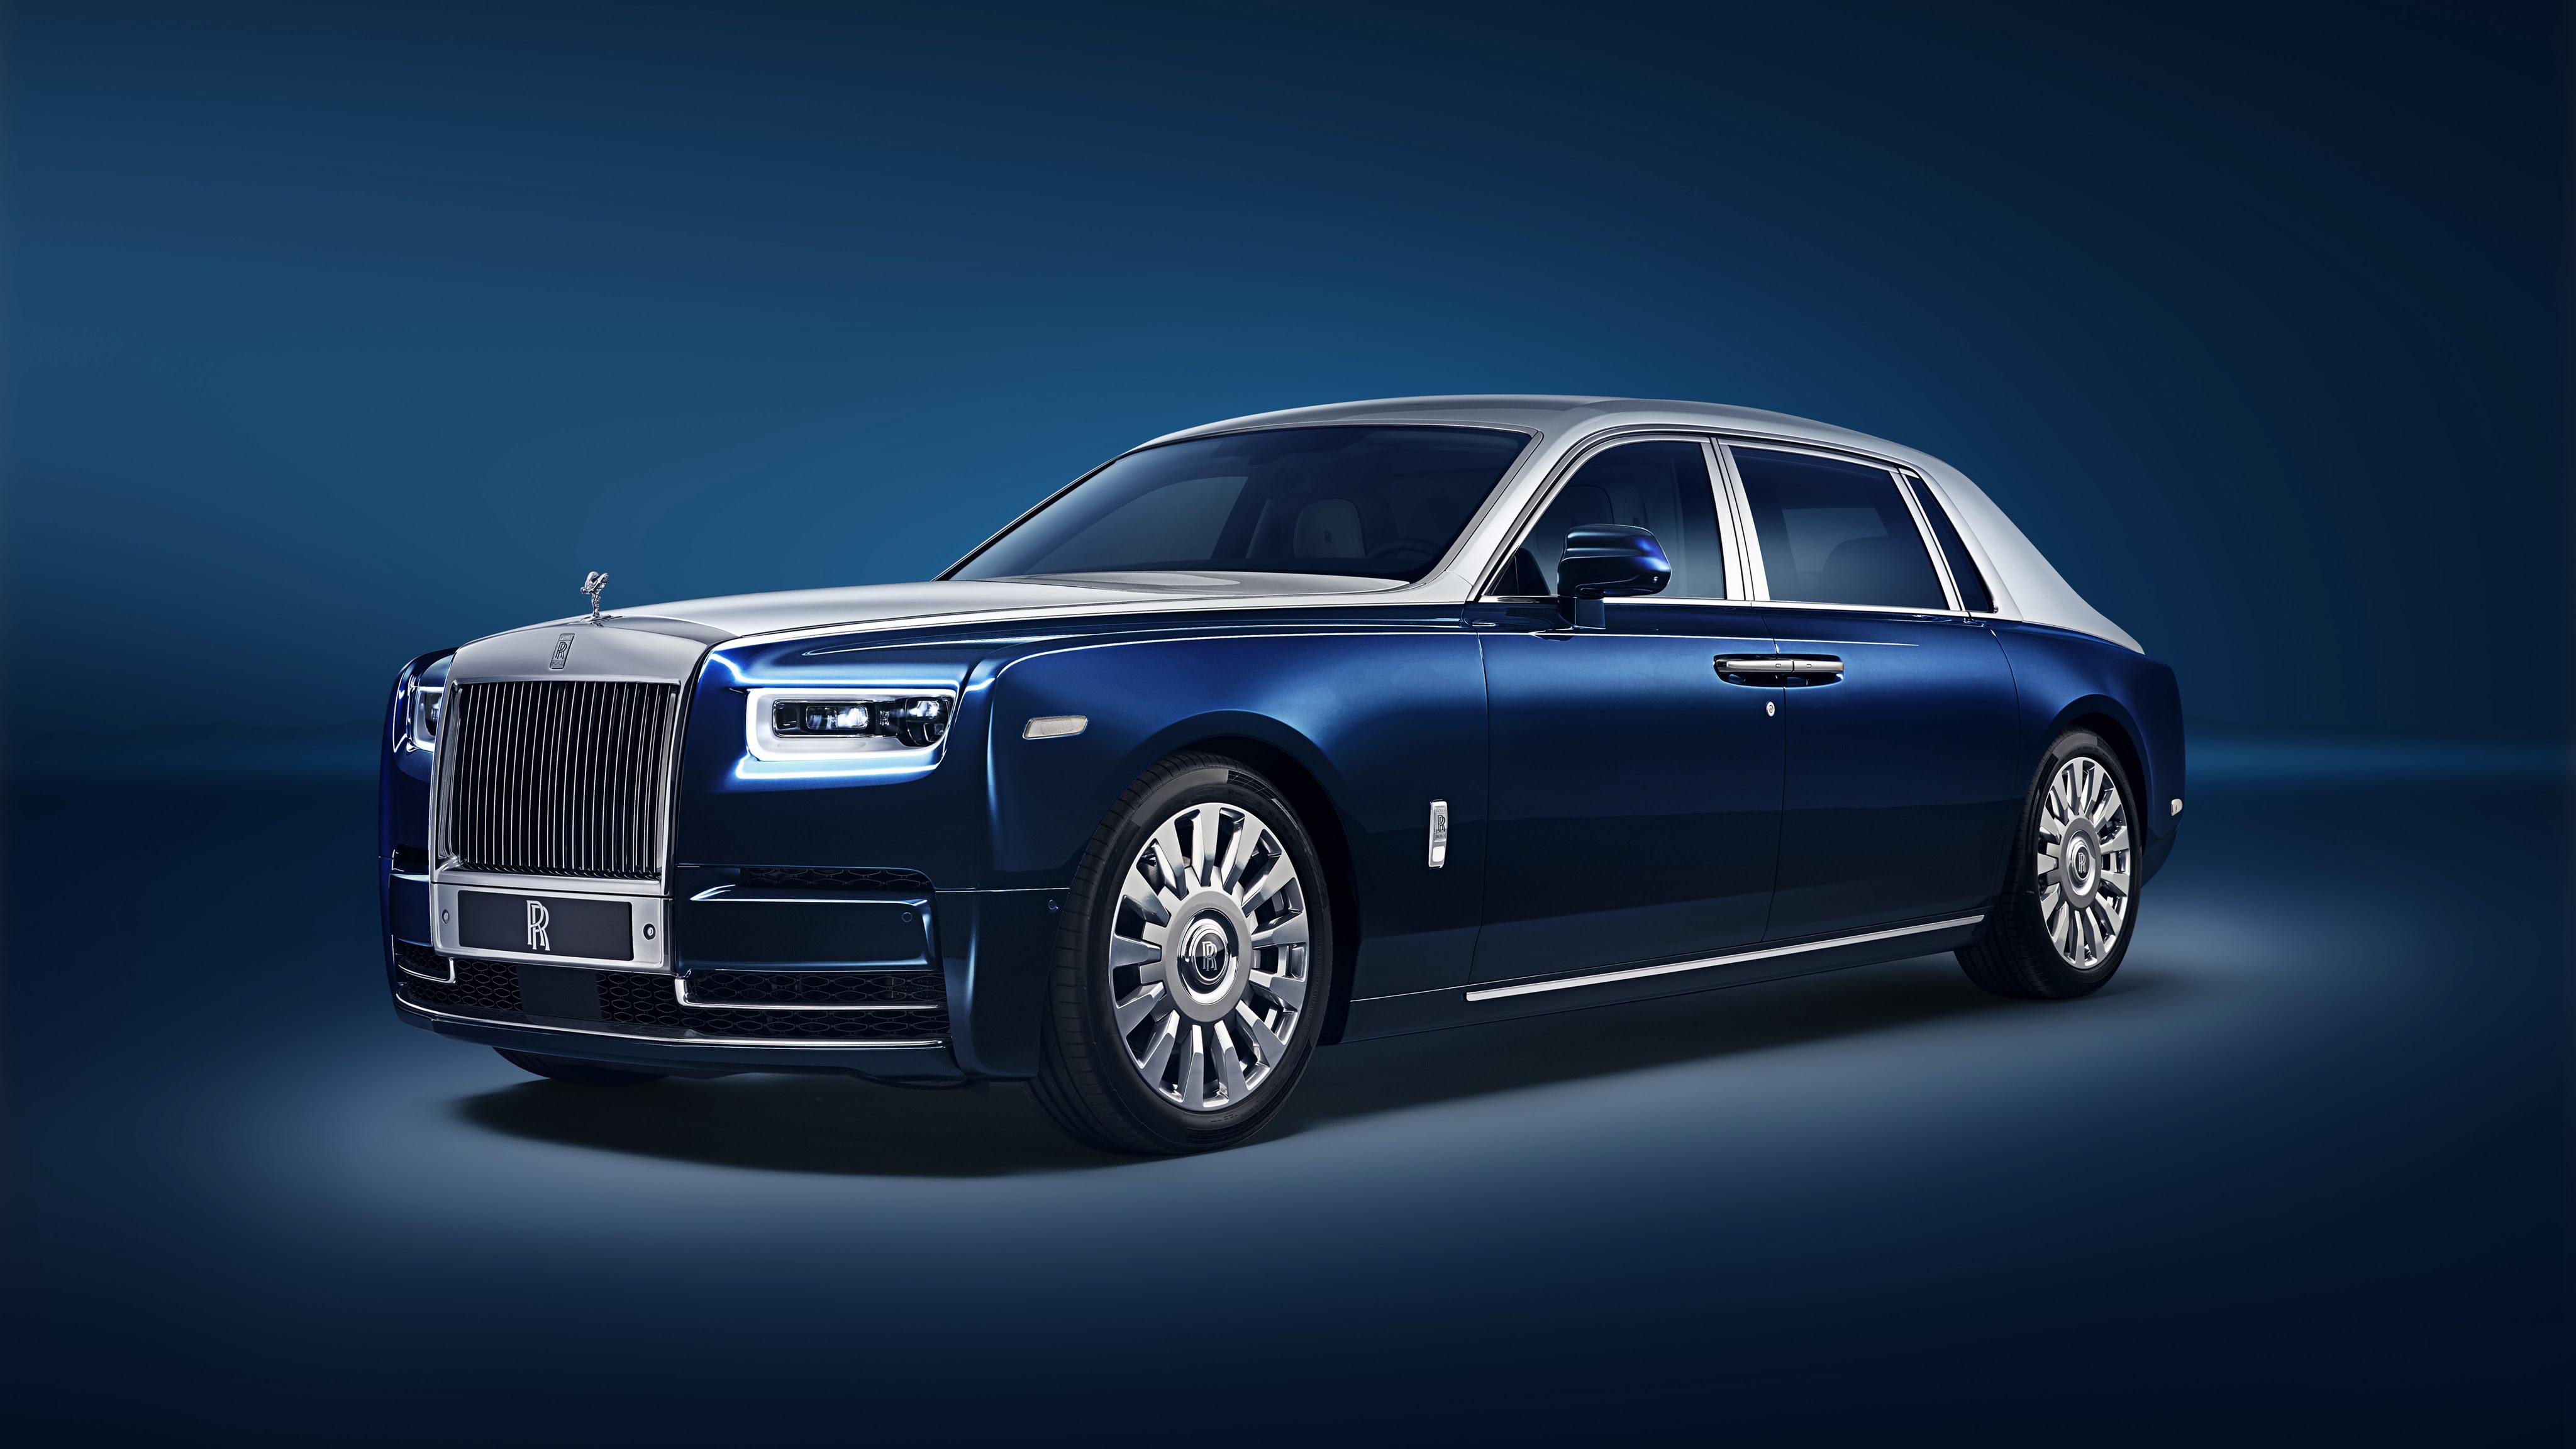 Rolls-Royce Phantom EWB Chengdu 2018 4K Wallpapers   HD ...